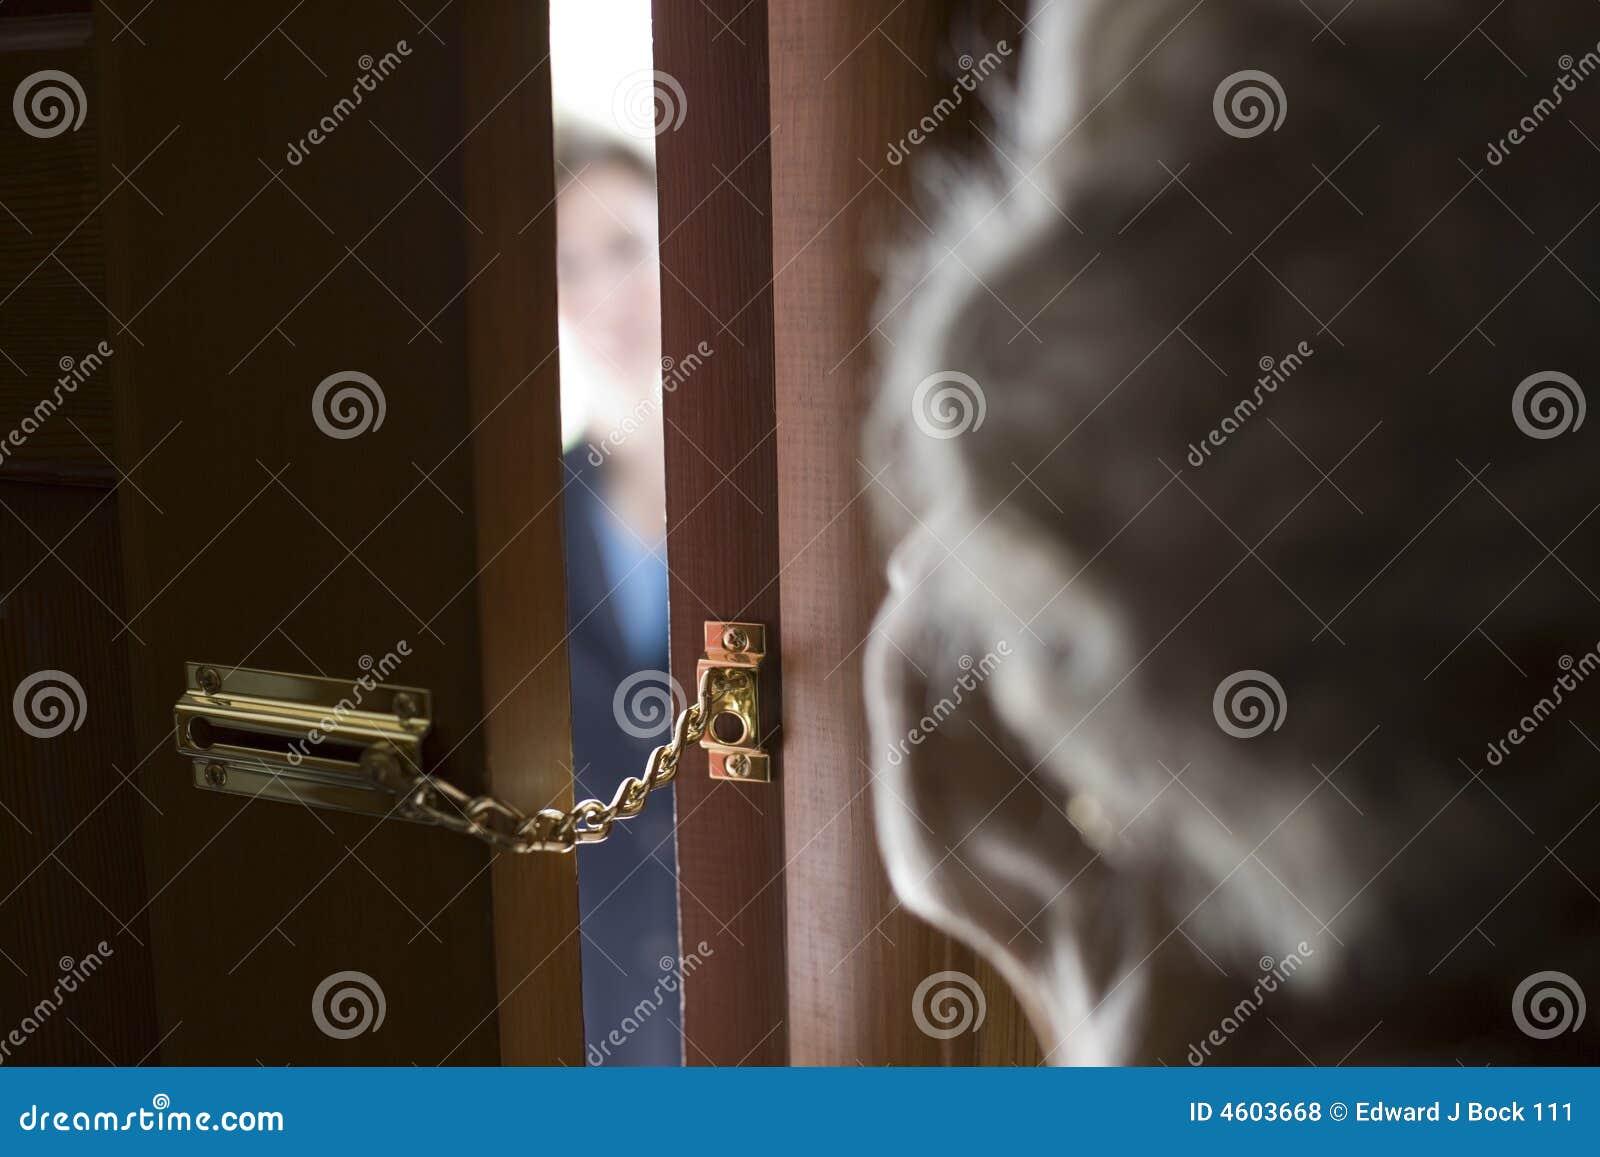 Extranjero en la puerta